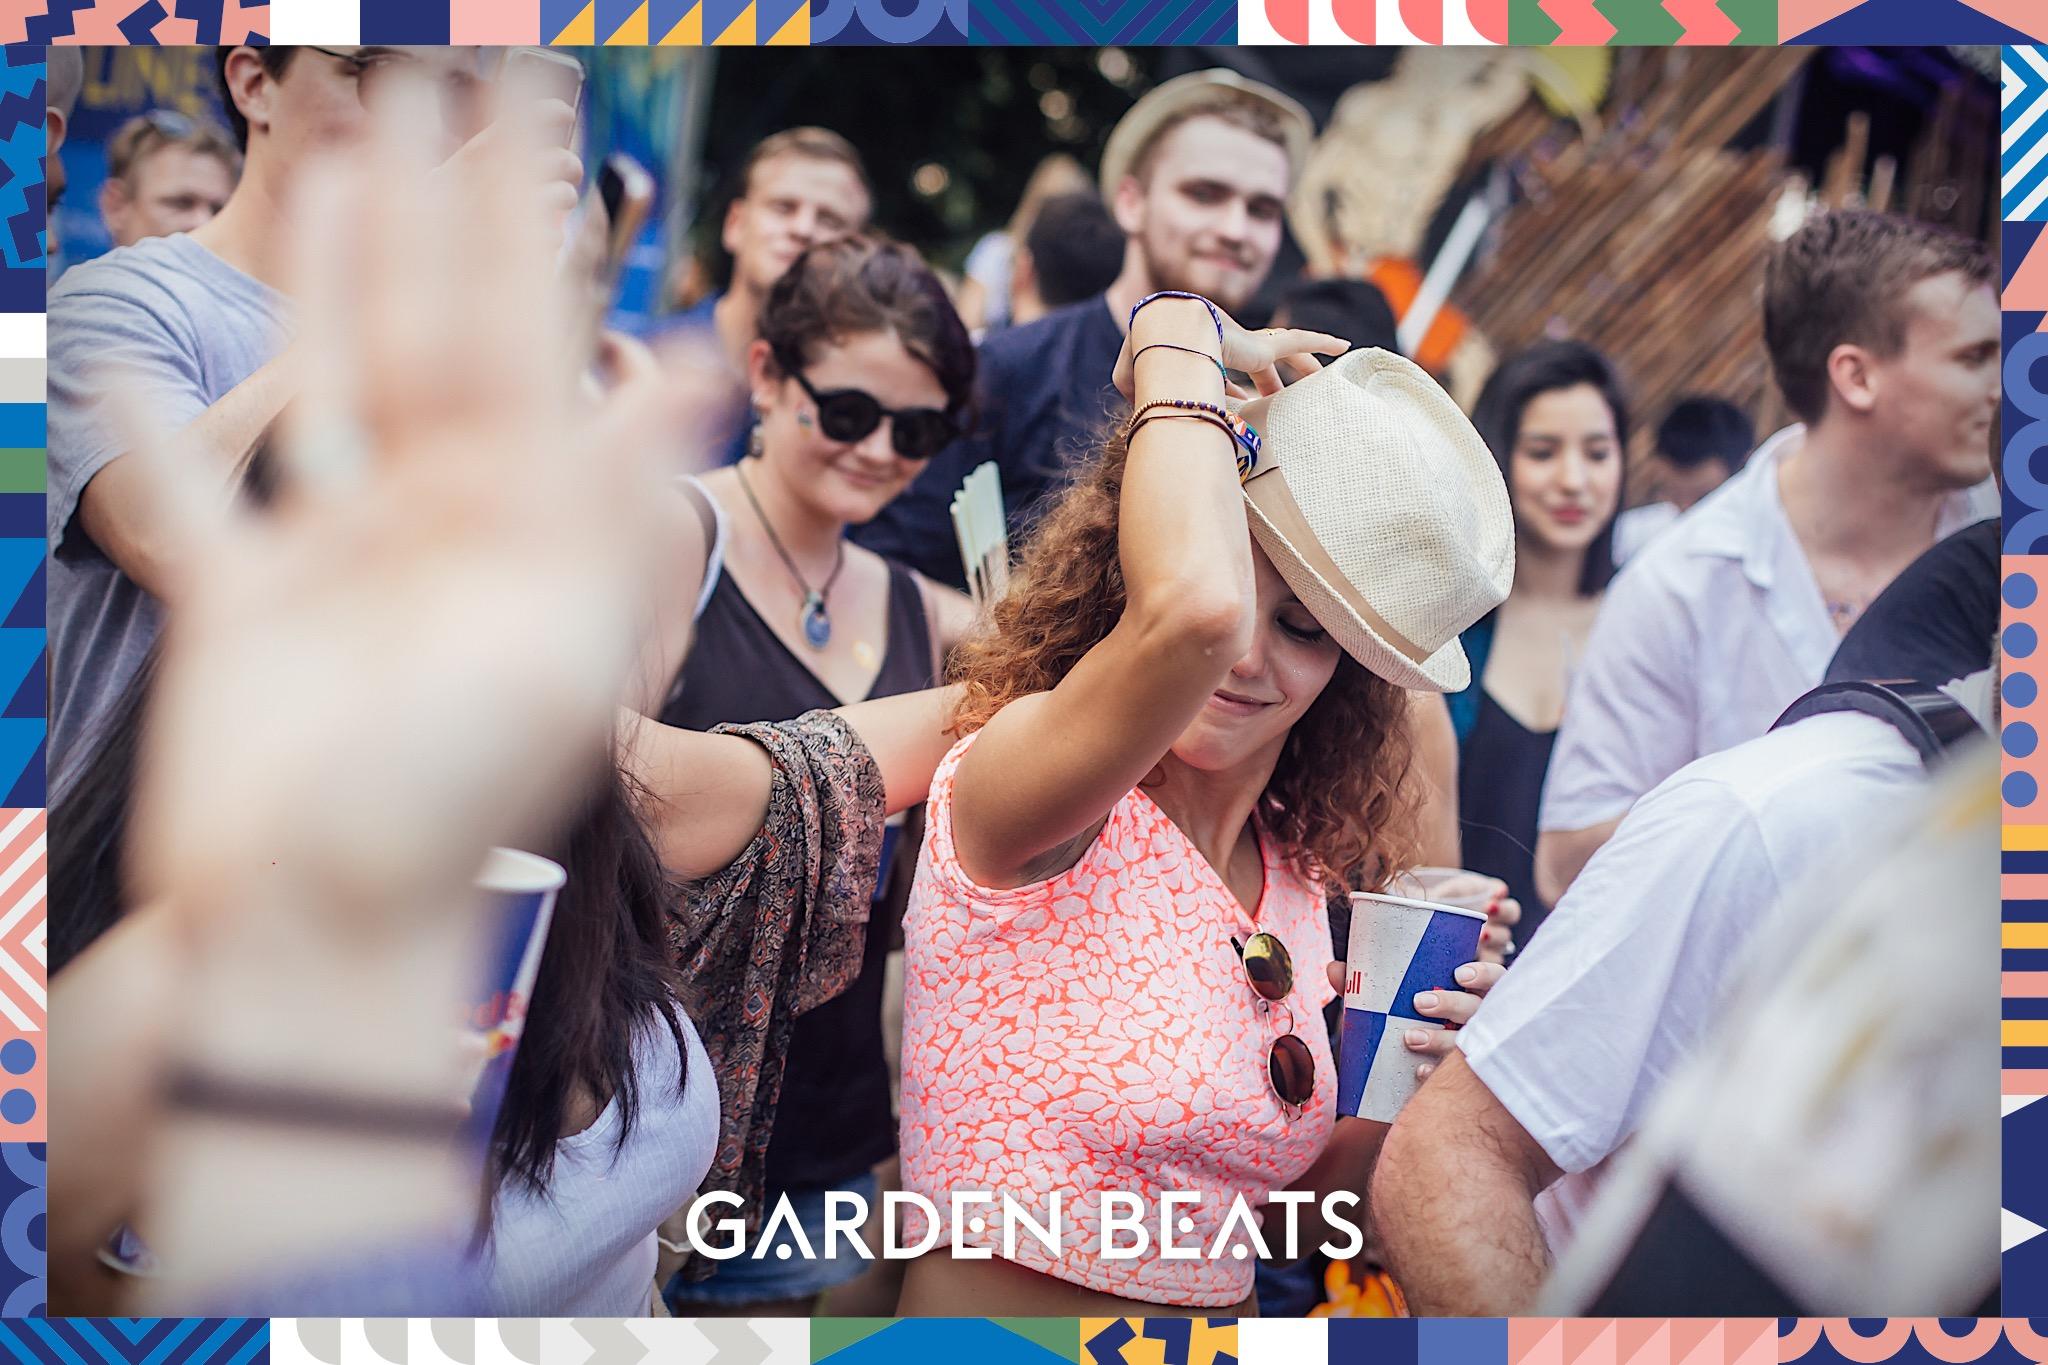 18032017_GardenBeats_Colossal619_WatermarkedGB.jpg